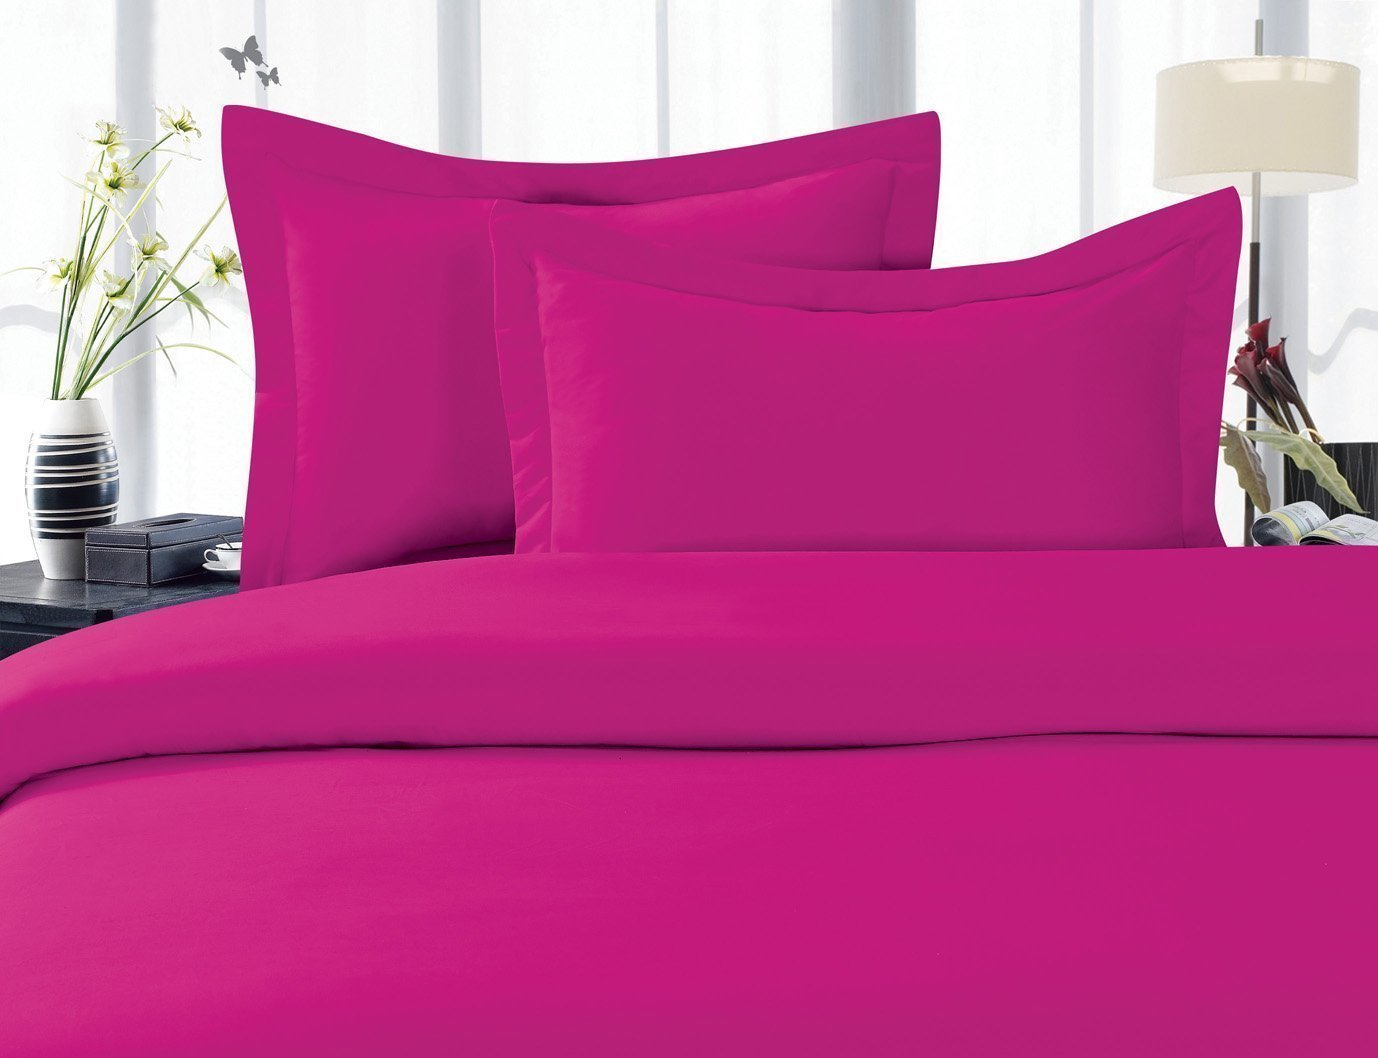 Hot Pink King Size Sheets - b